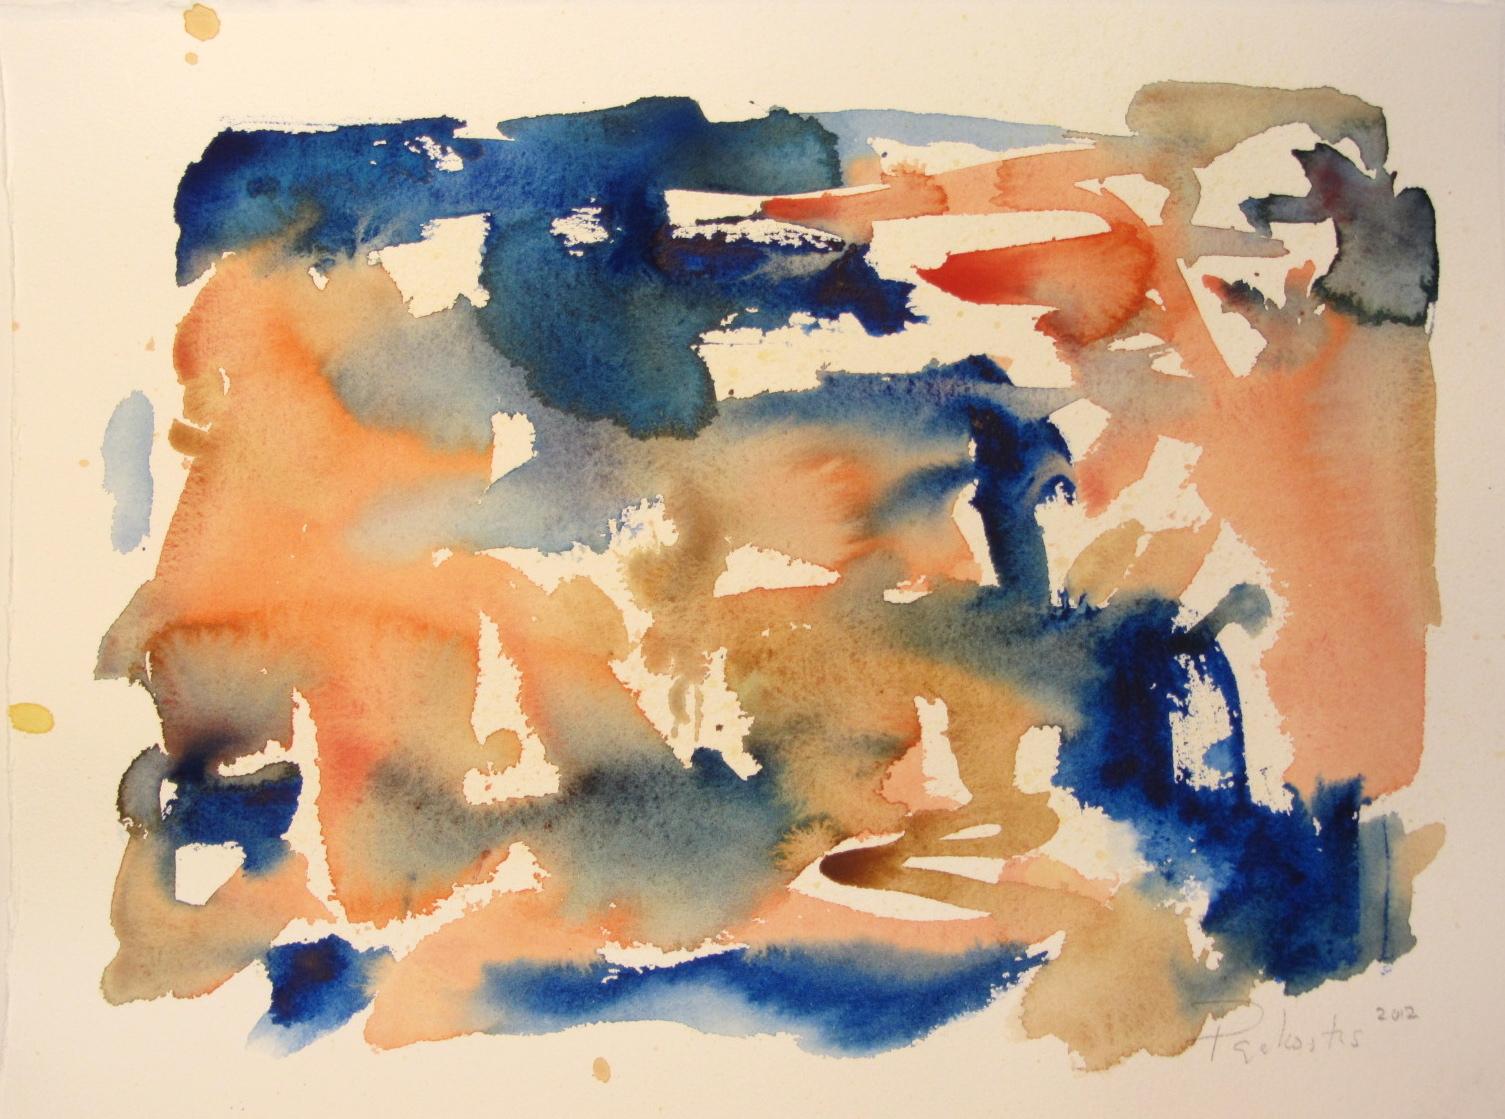 2012, watercolour on paper 27.94 x 38.10cm (11 x 15in.)IMG_0090.JPG